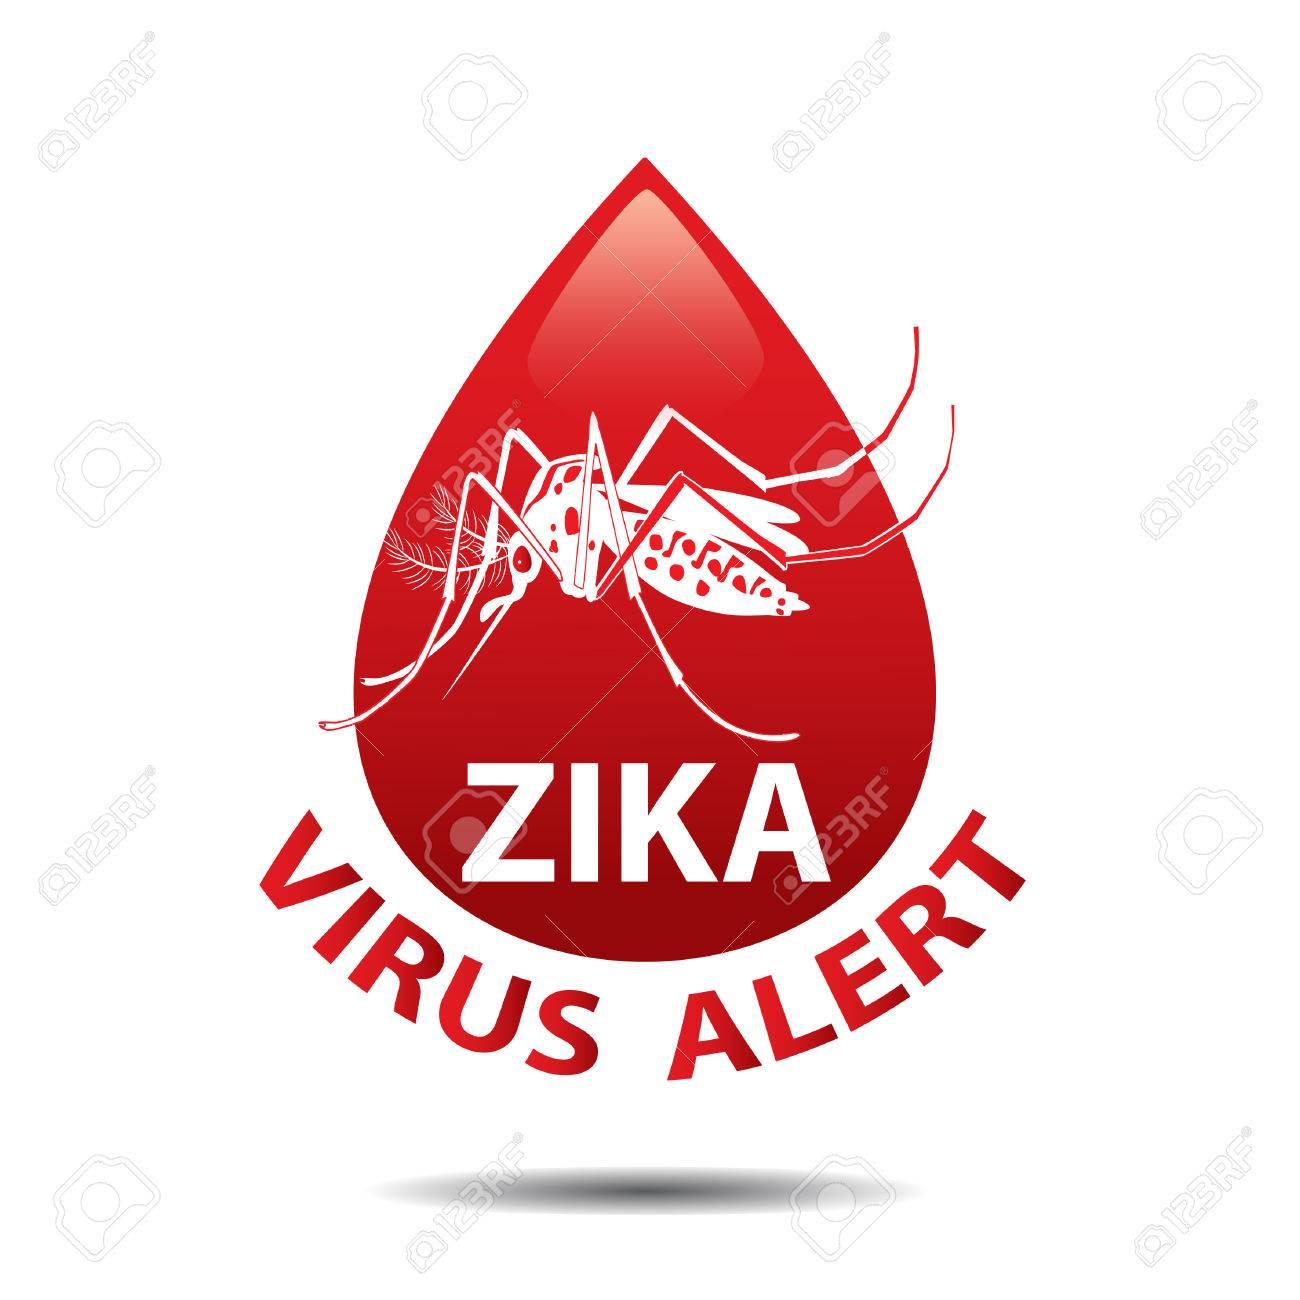 Zika Icono Virus Mosquito Aislado Bebé Zika Icono Virus Concepto Alerta Brote Contra Virus De Aaegypti Mosquito Virus Zika La Señal De Peligro